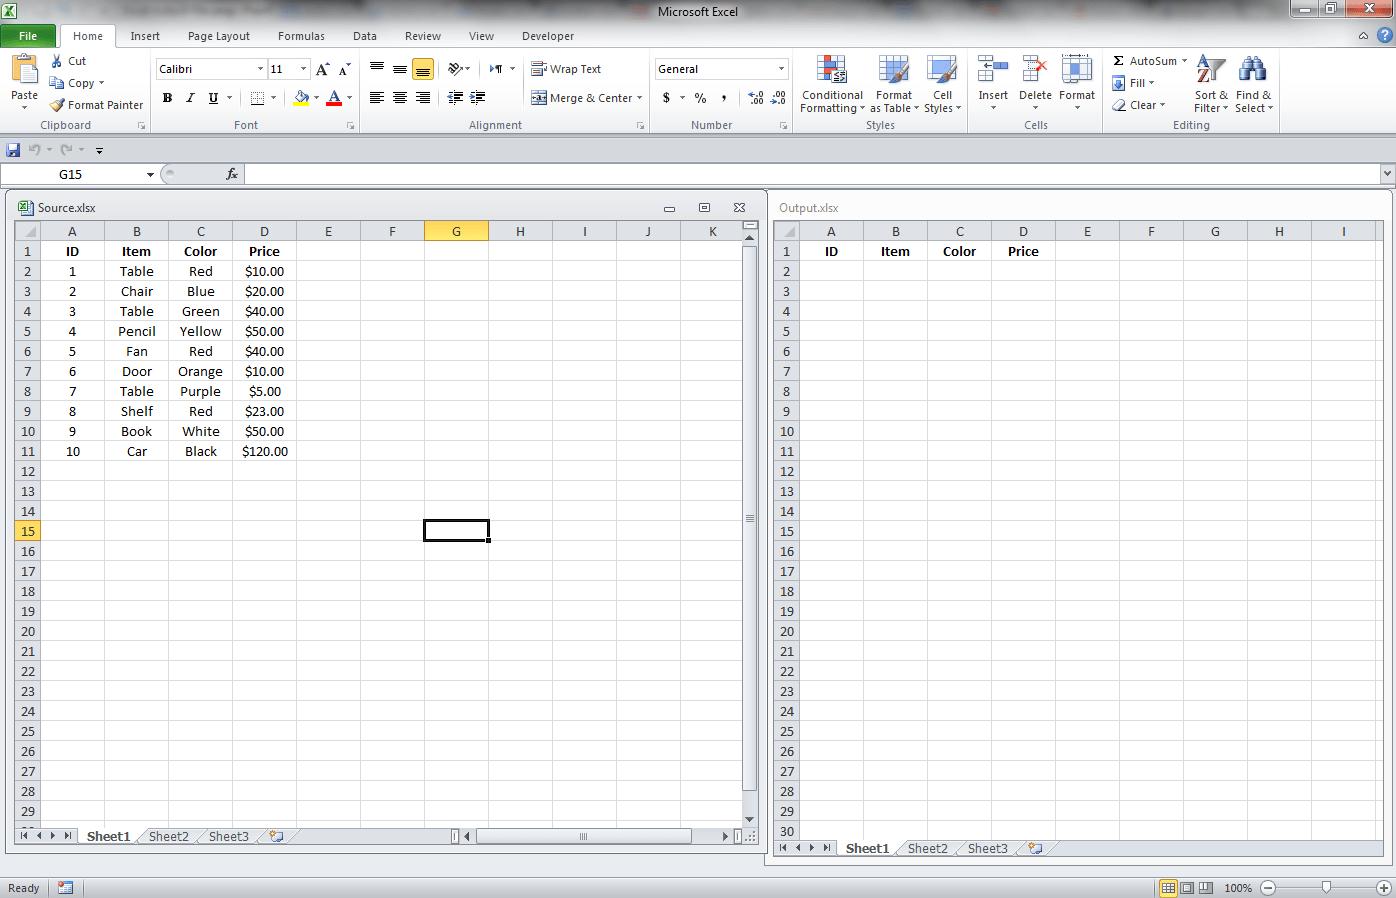 Worksheet Range Activate